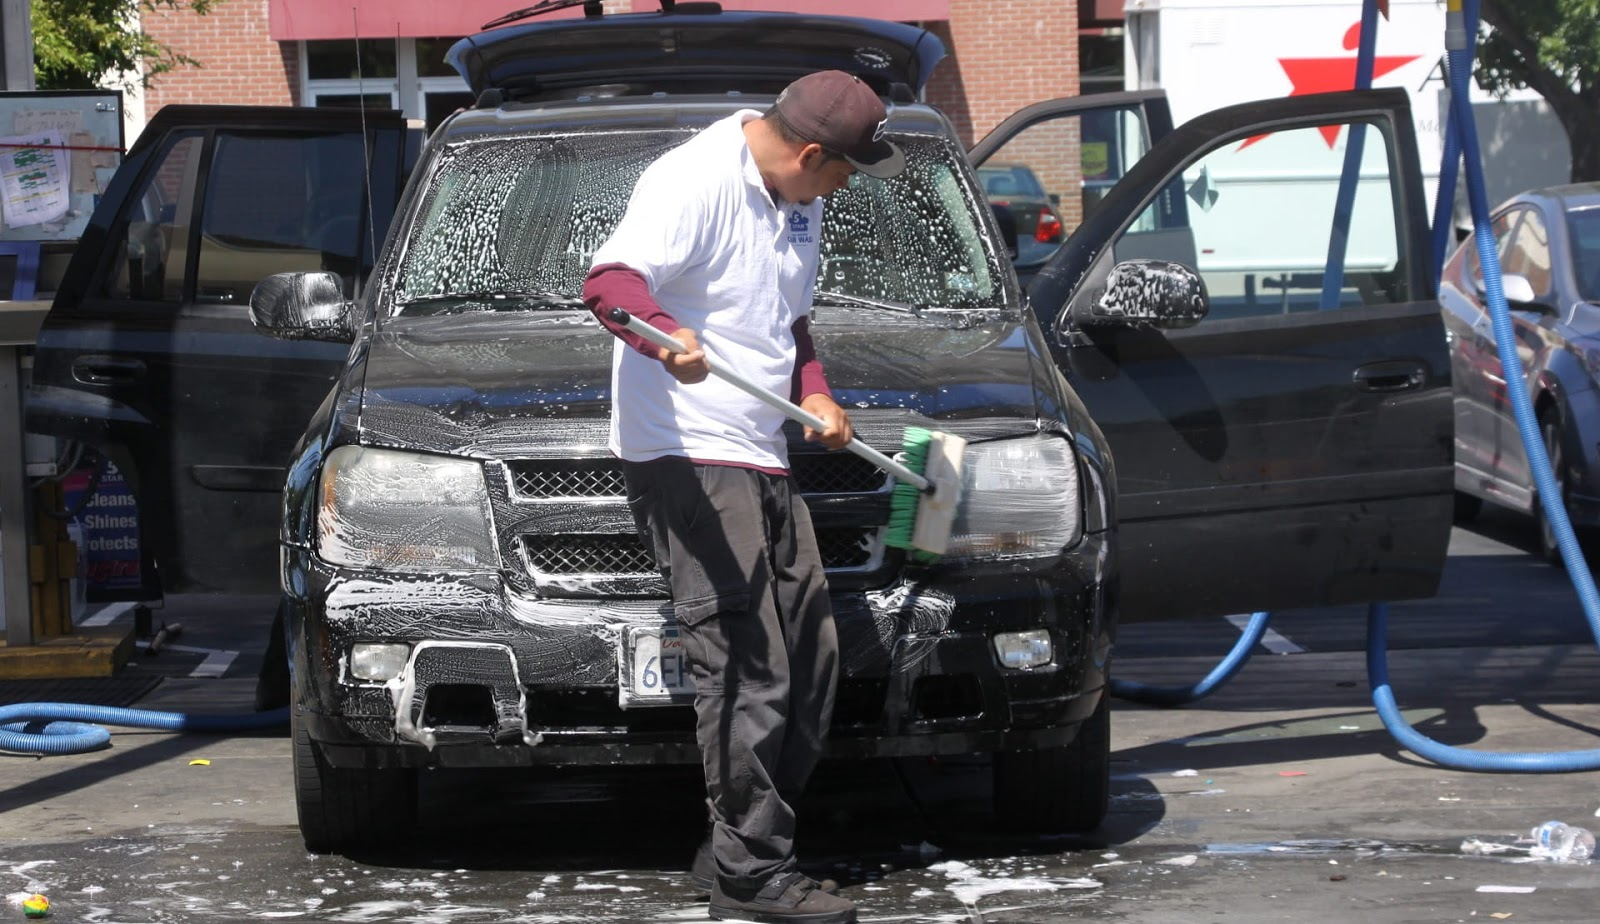 kinh doanh dịch vụ rửa xe